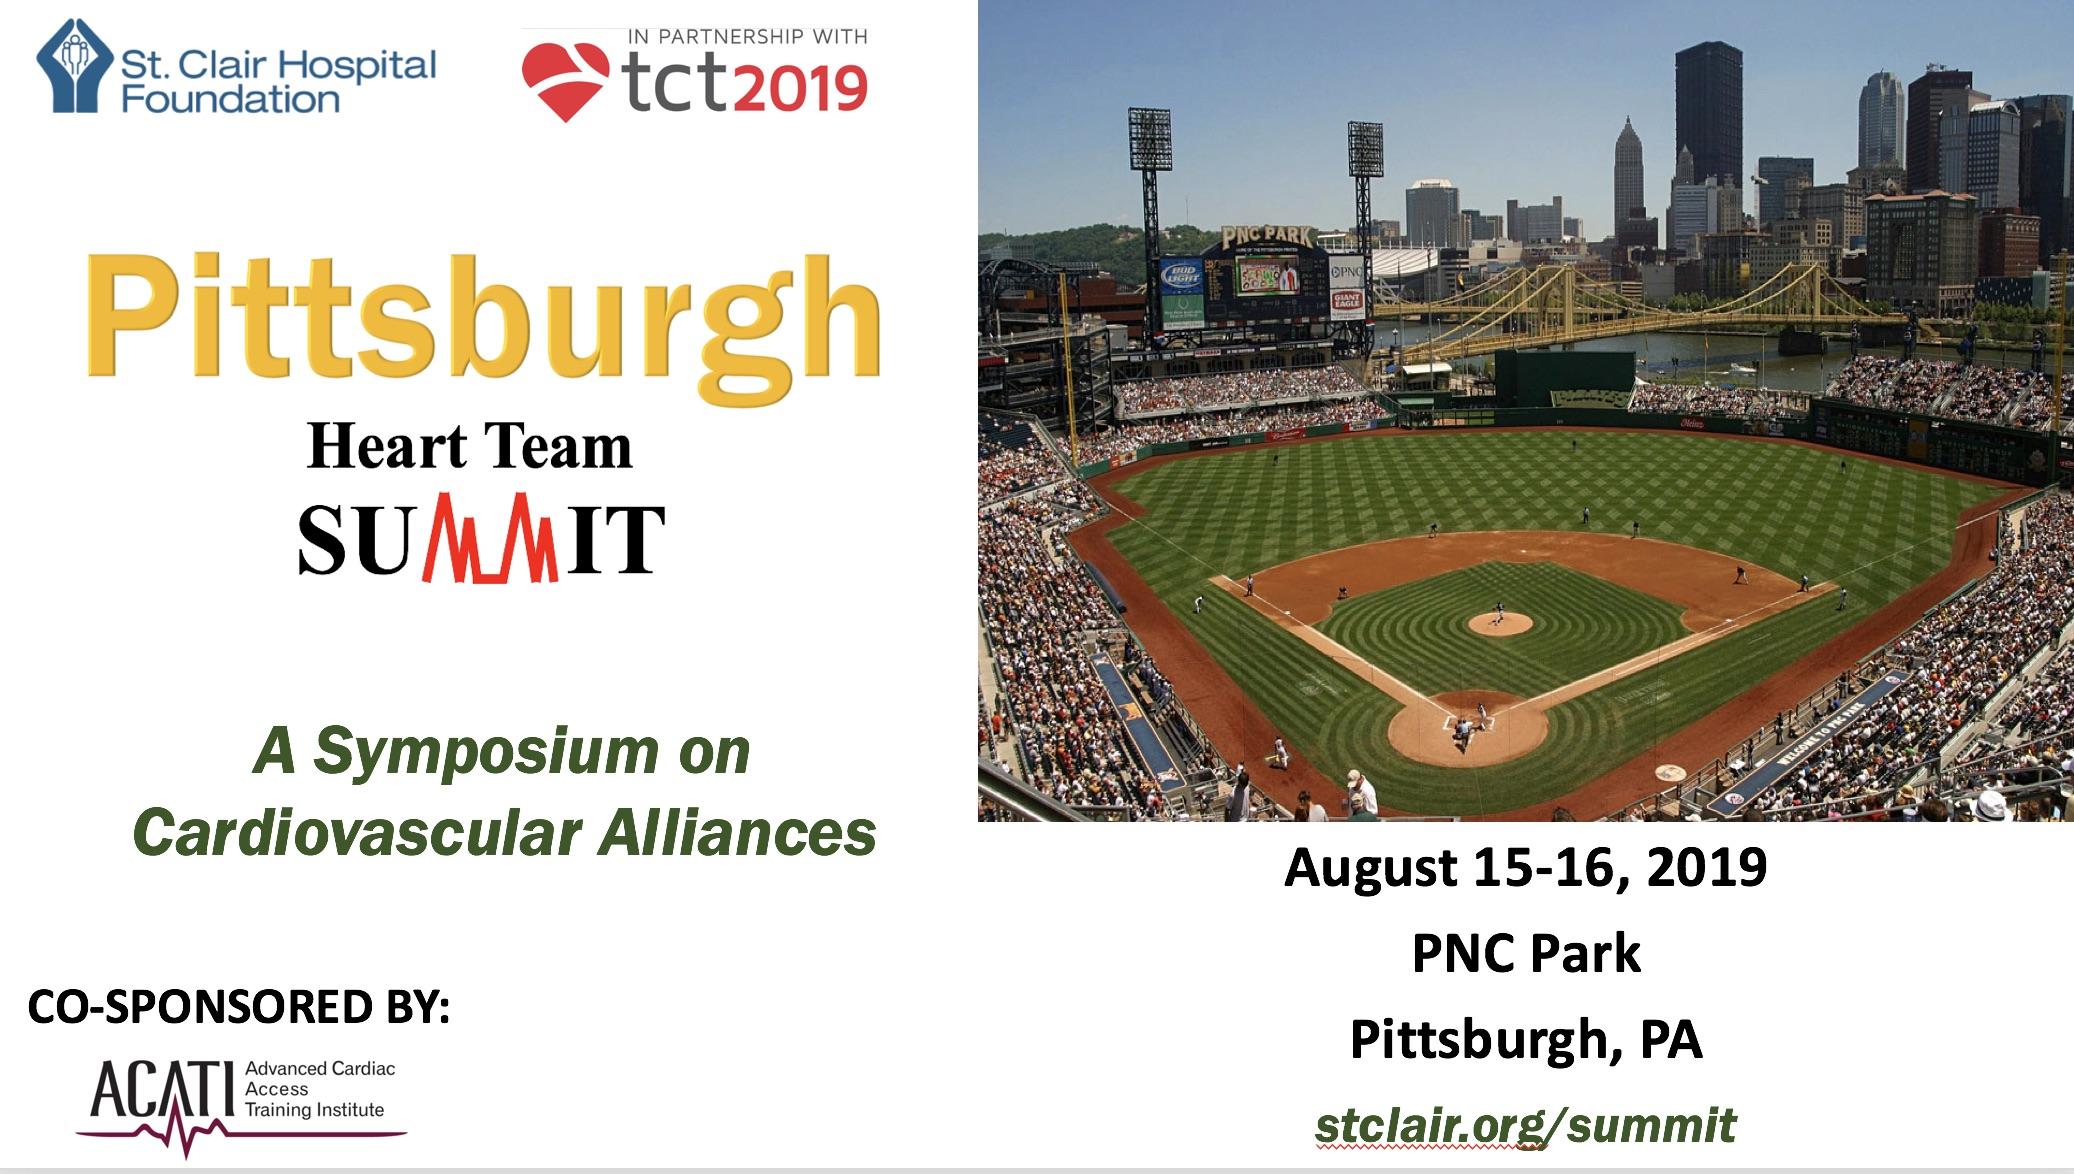 PITTSBURGH Summit